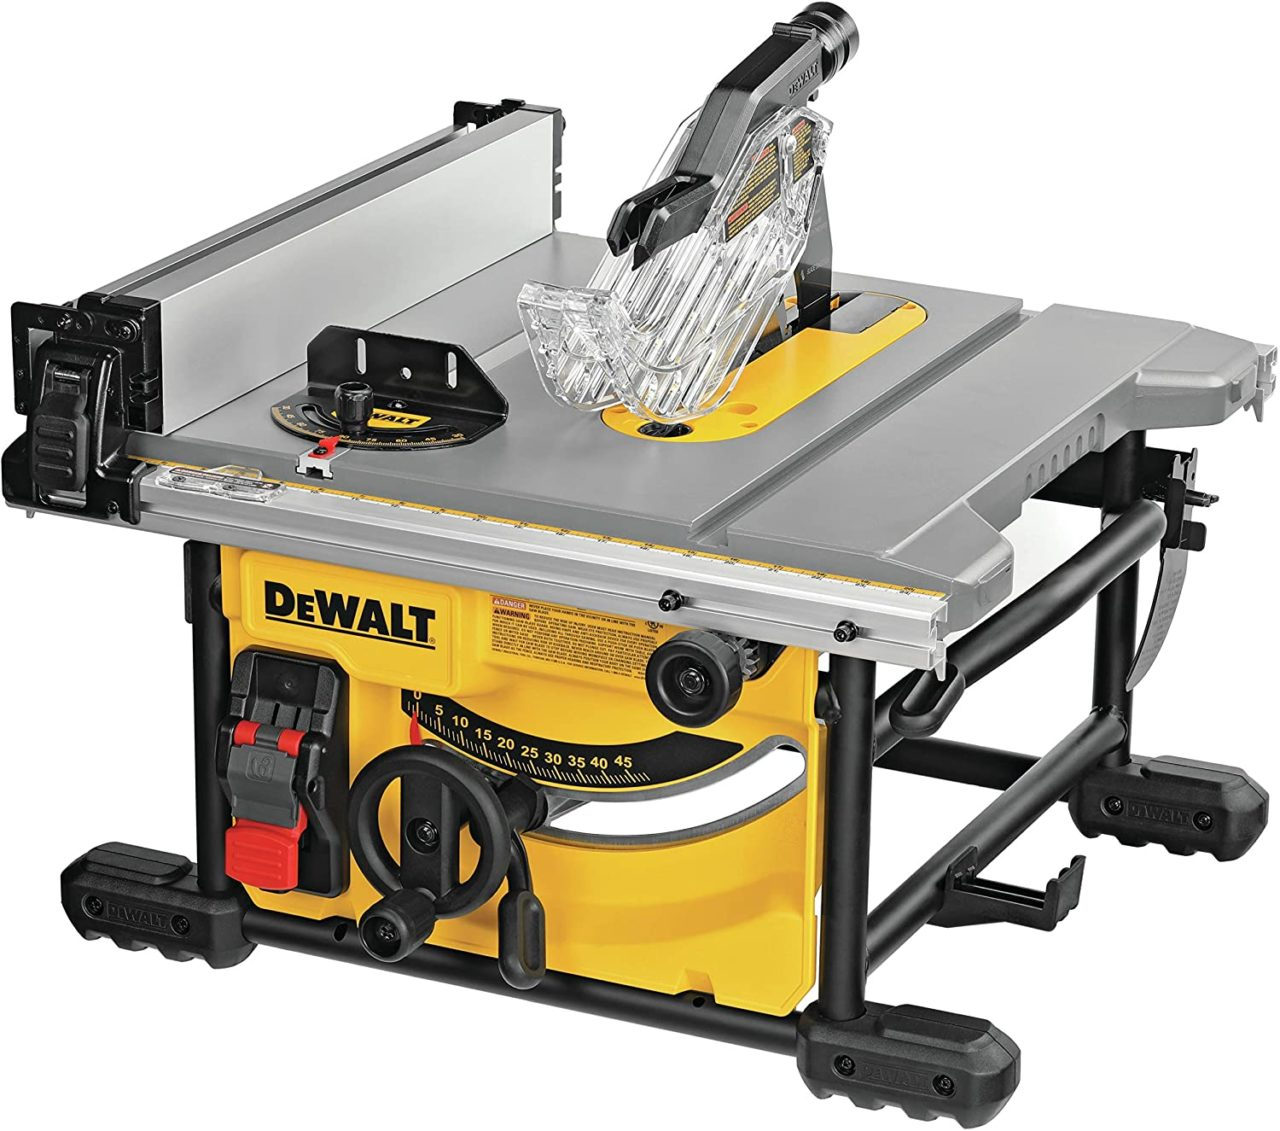 DeWALT DWE7485 - best portable table saw for the money